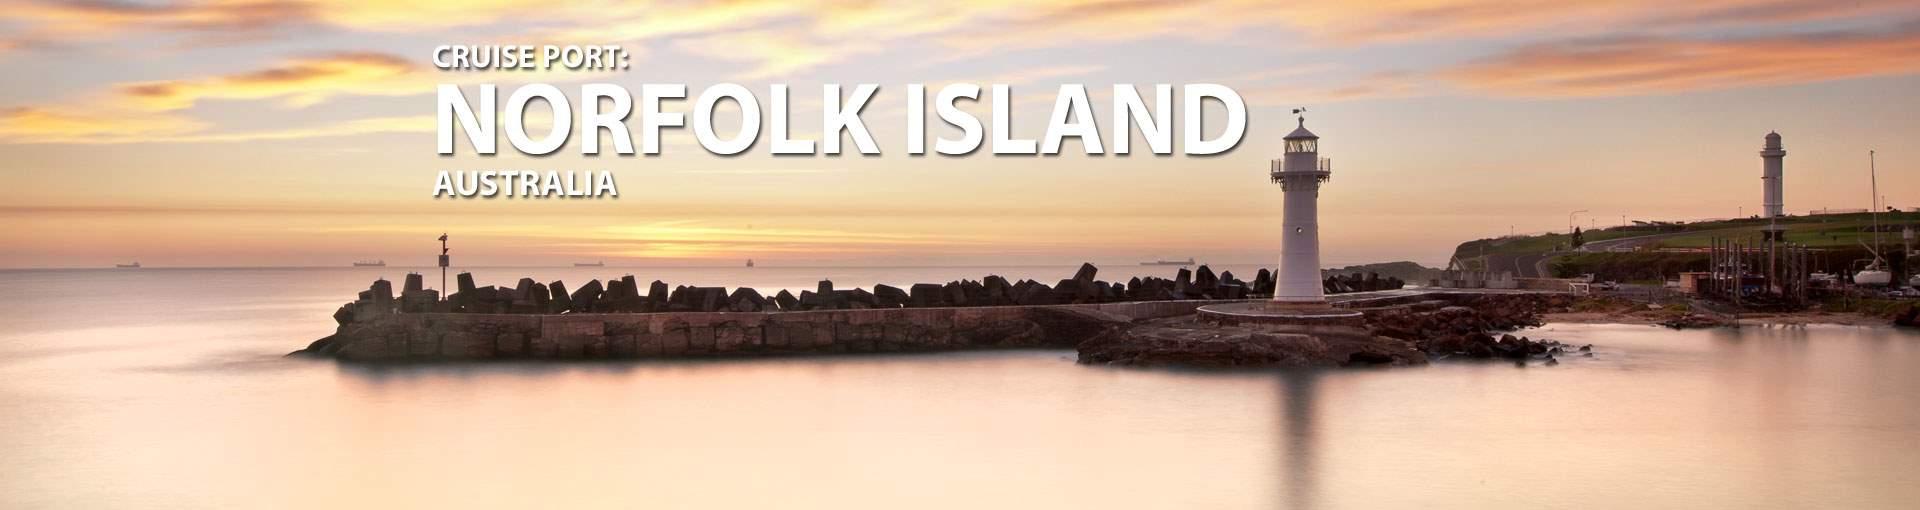 Cruises to Norfolk Island, Australia